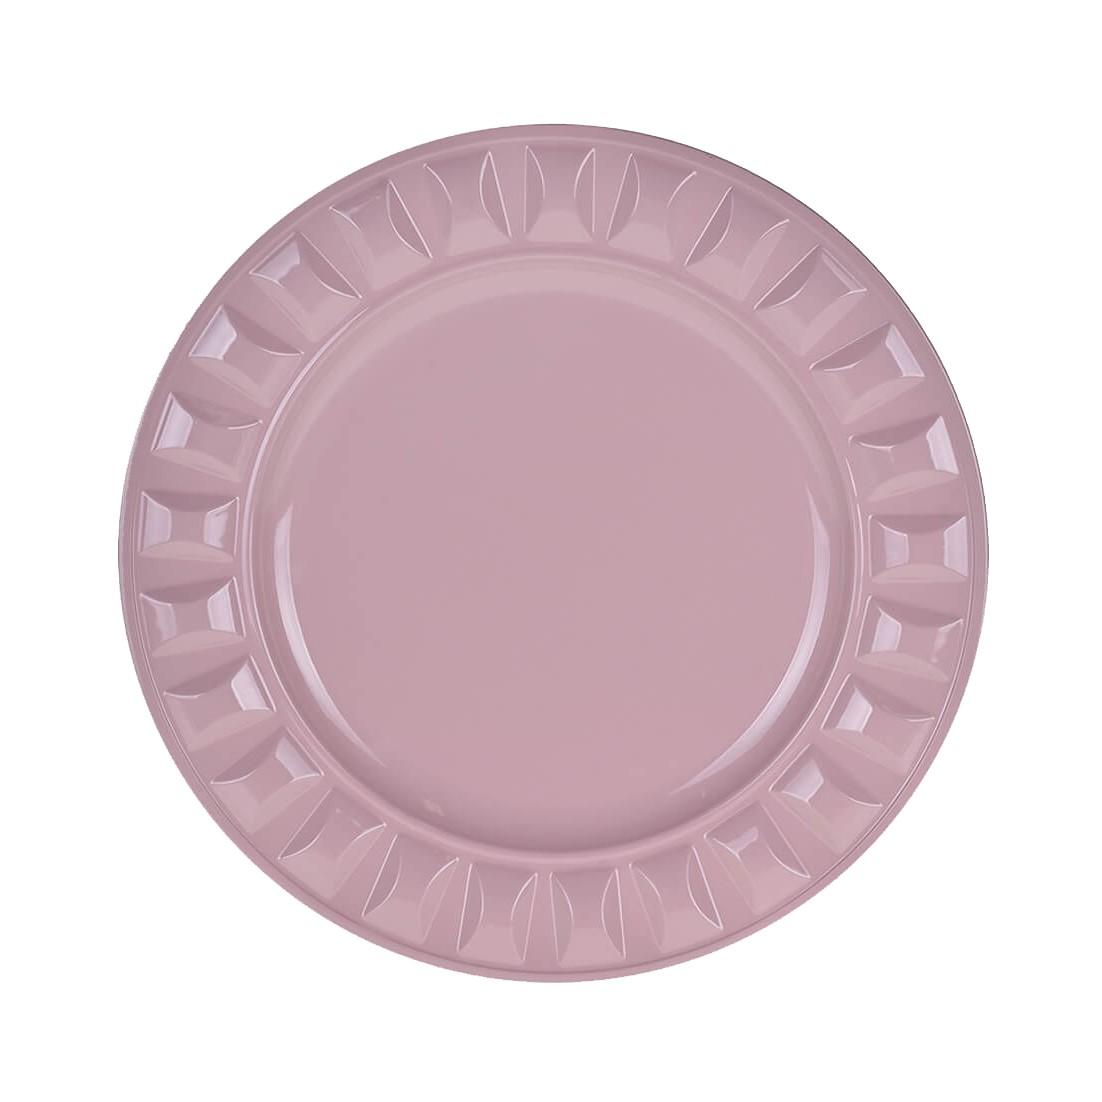 Sousplat Redondo Plastico 33cm Rosa - G Presentes